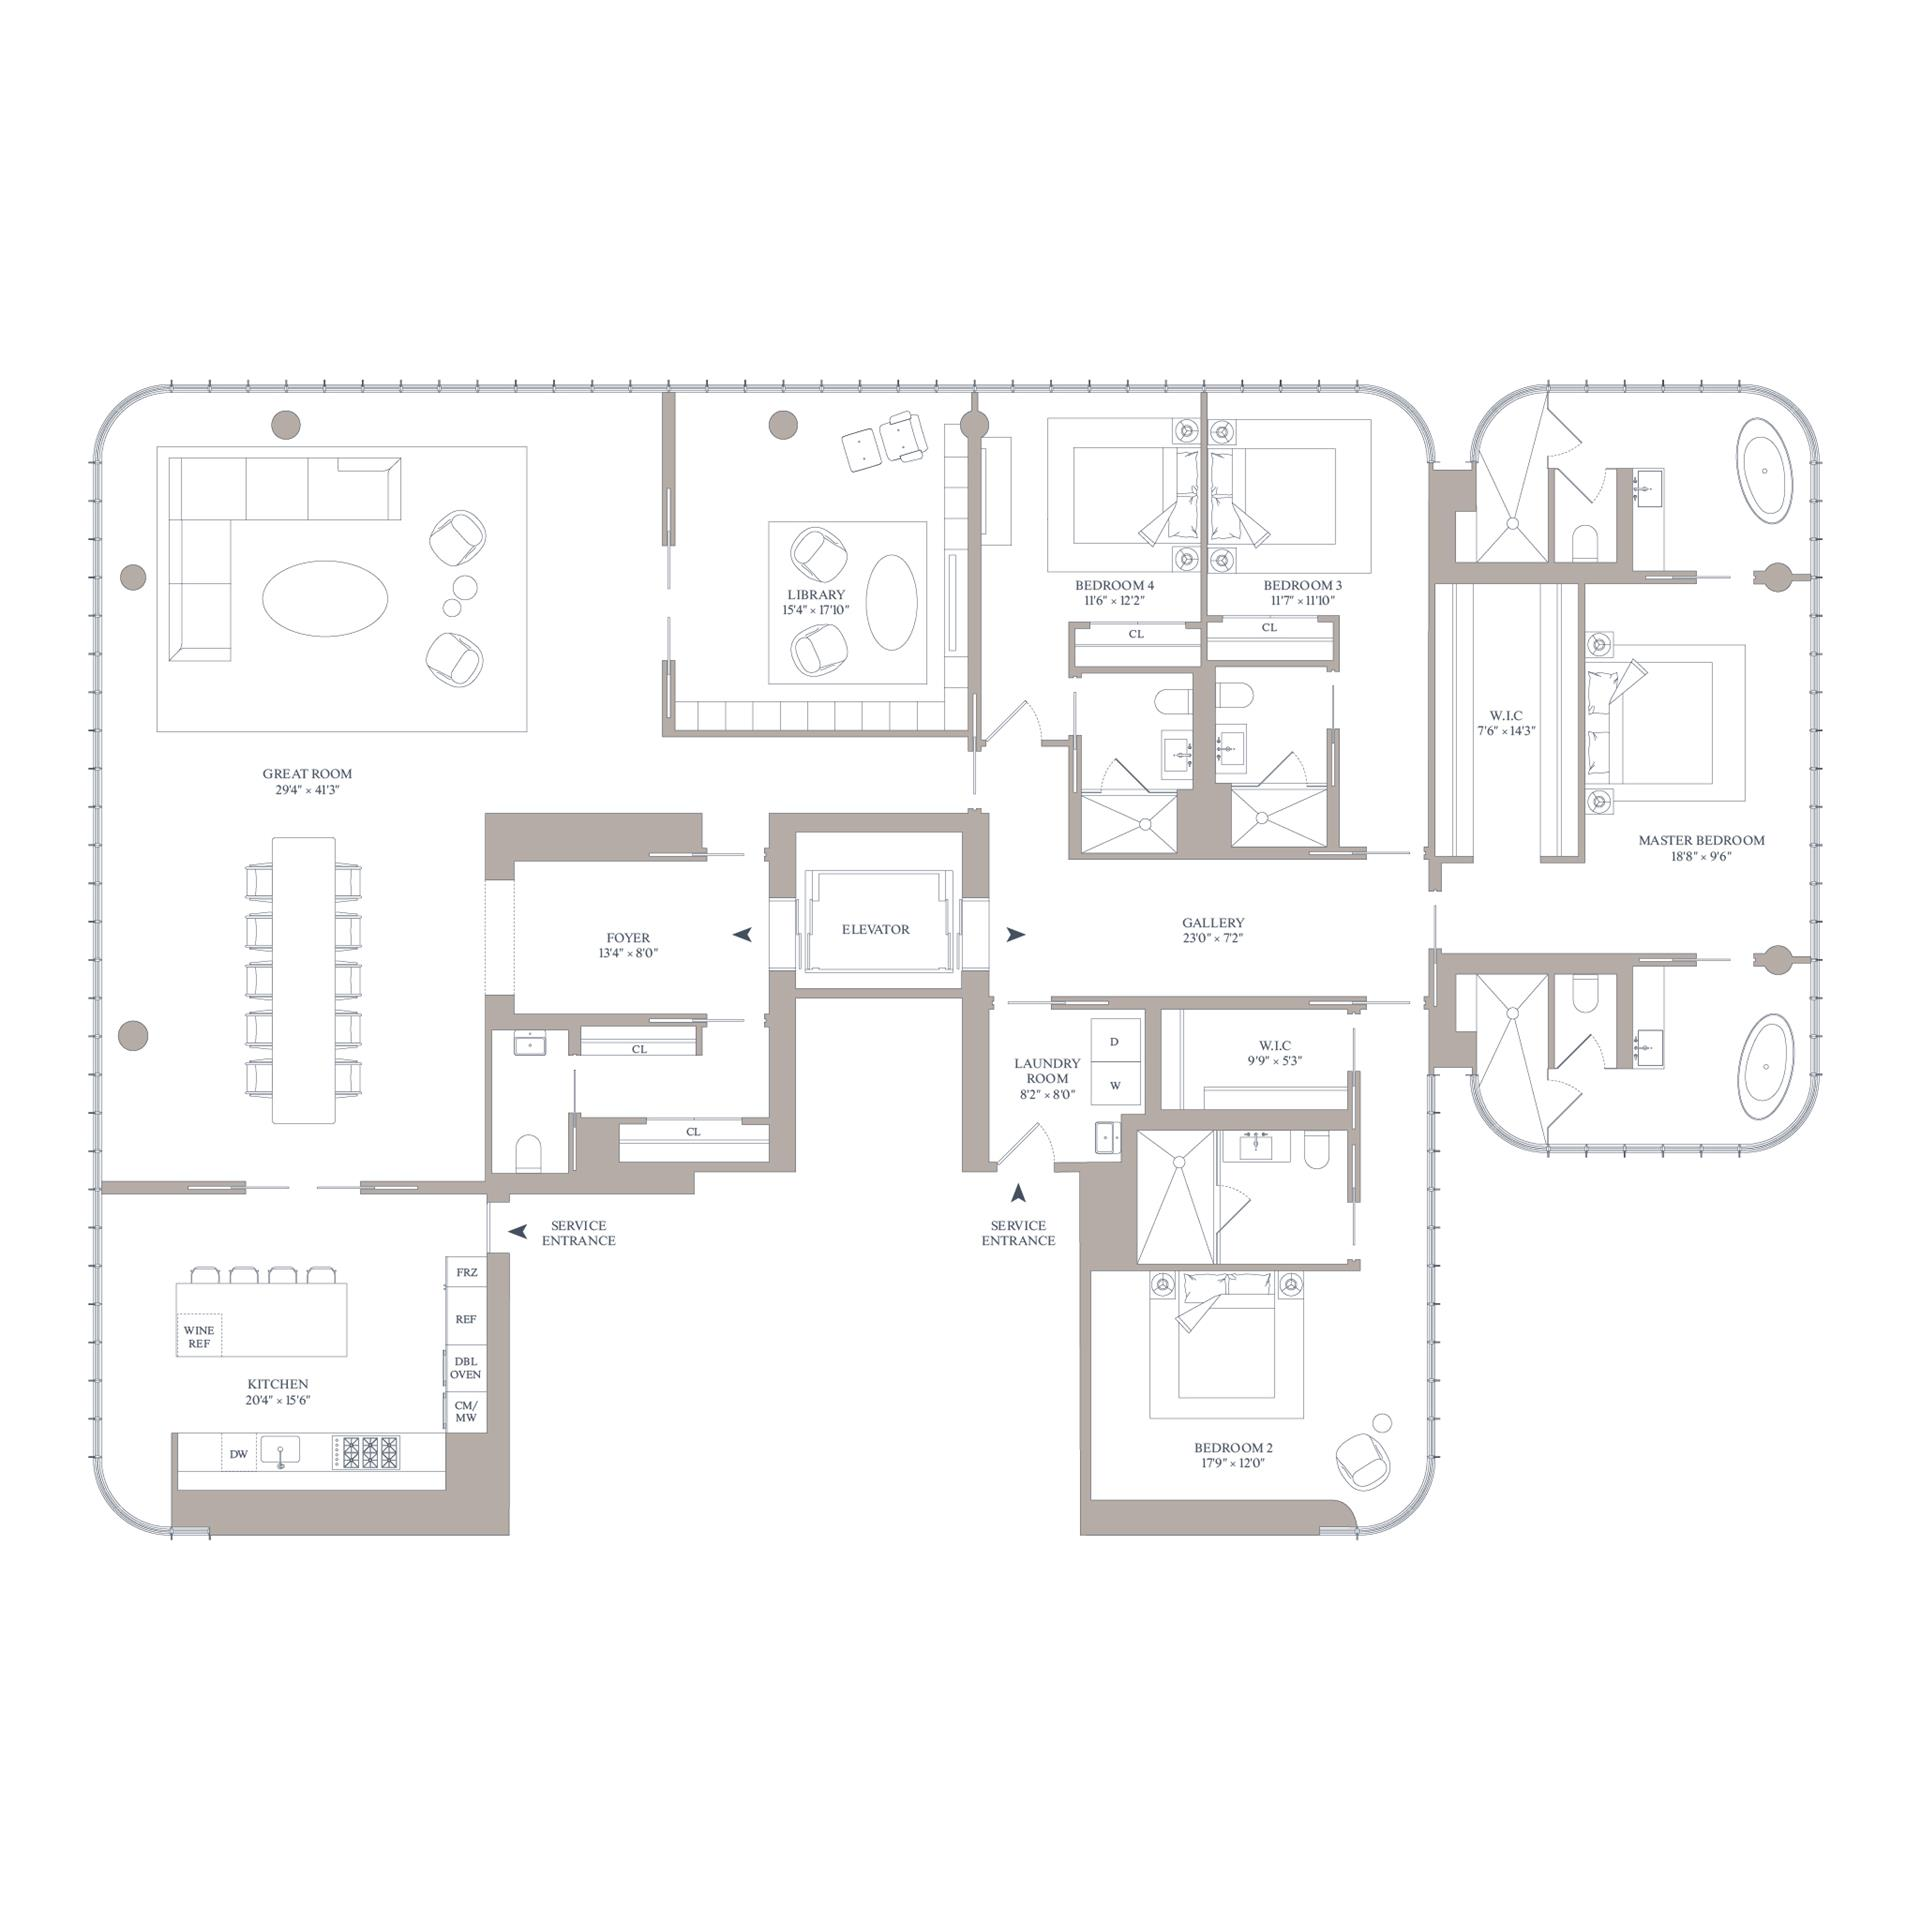 Floor plan of 565 Broome Street, N28A - SoHo - Nolita, New York